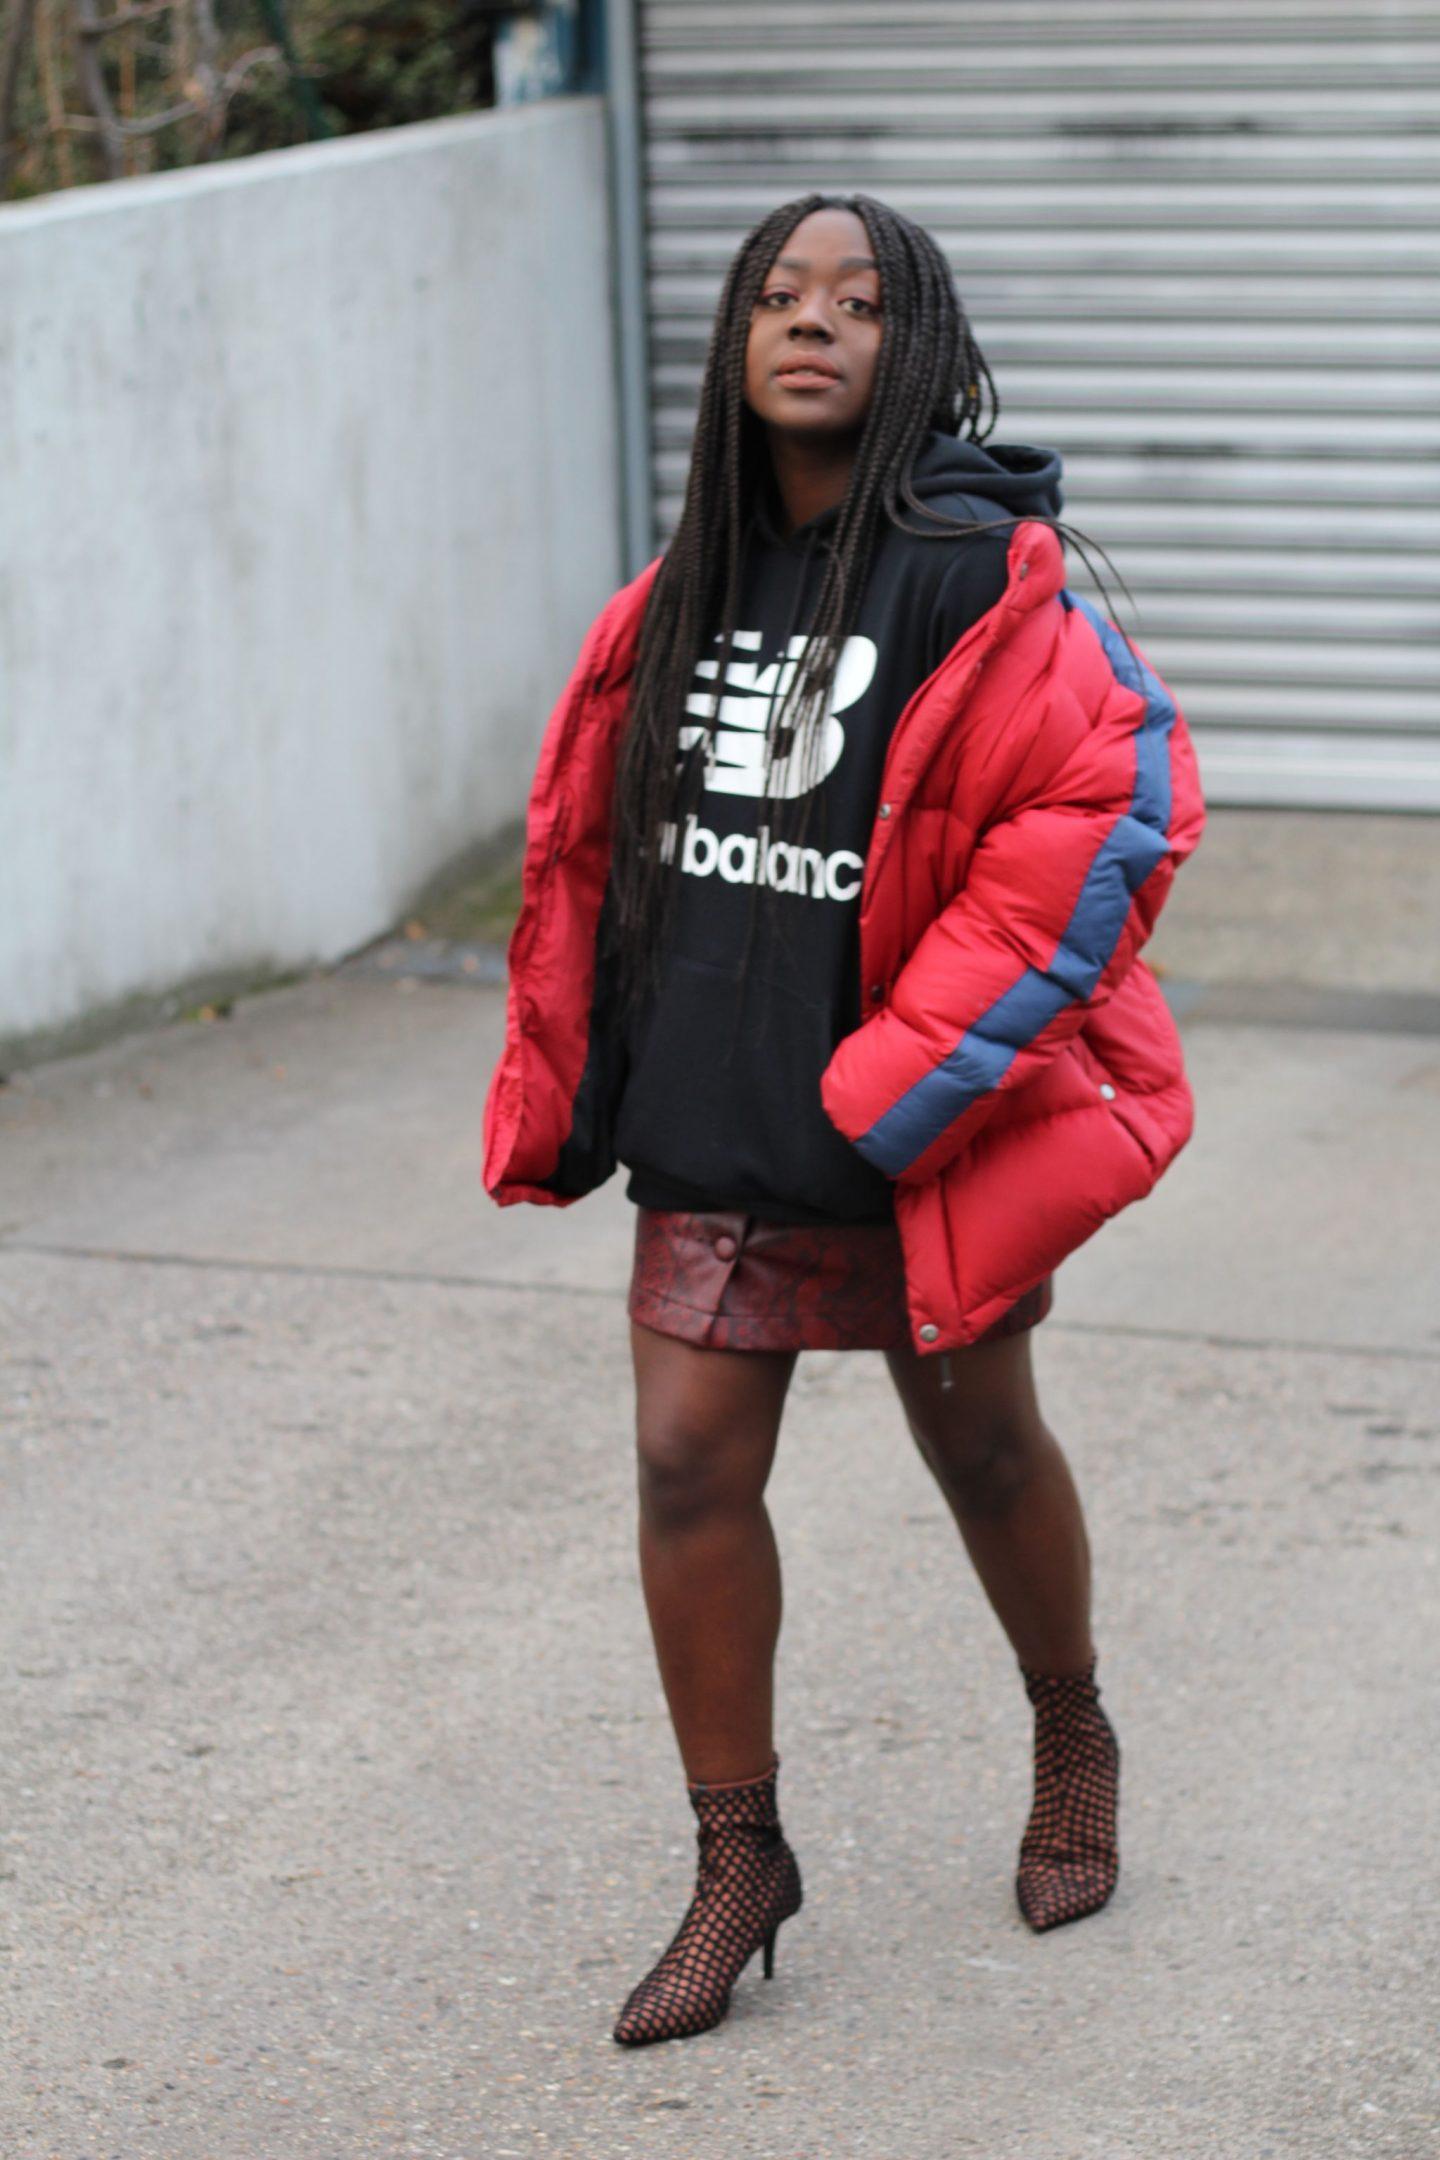 streetwear_chic_lois_opoku_fashion_blog_style_berlin_lisforlois_6